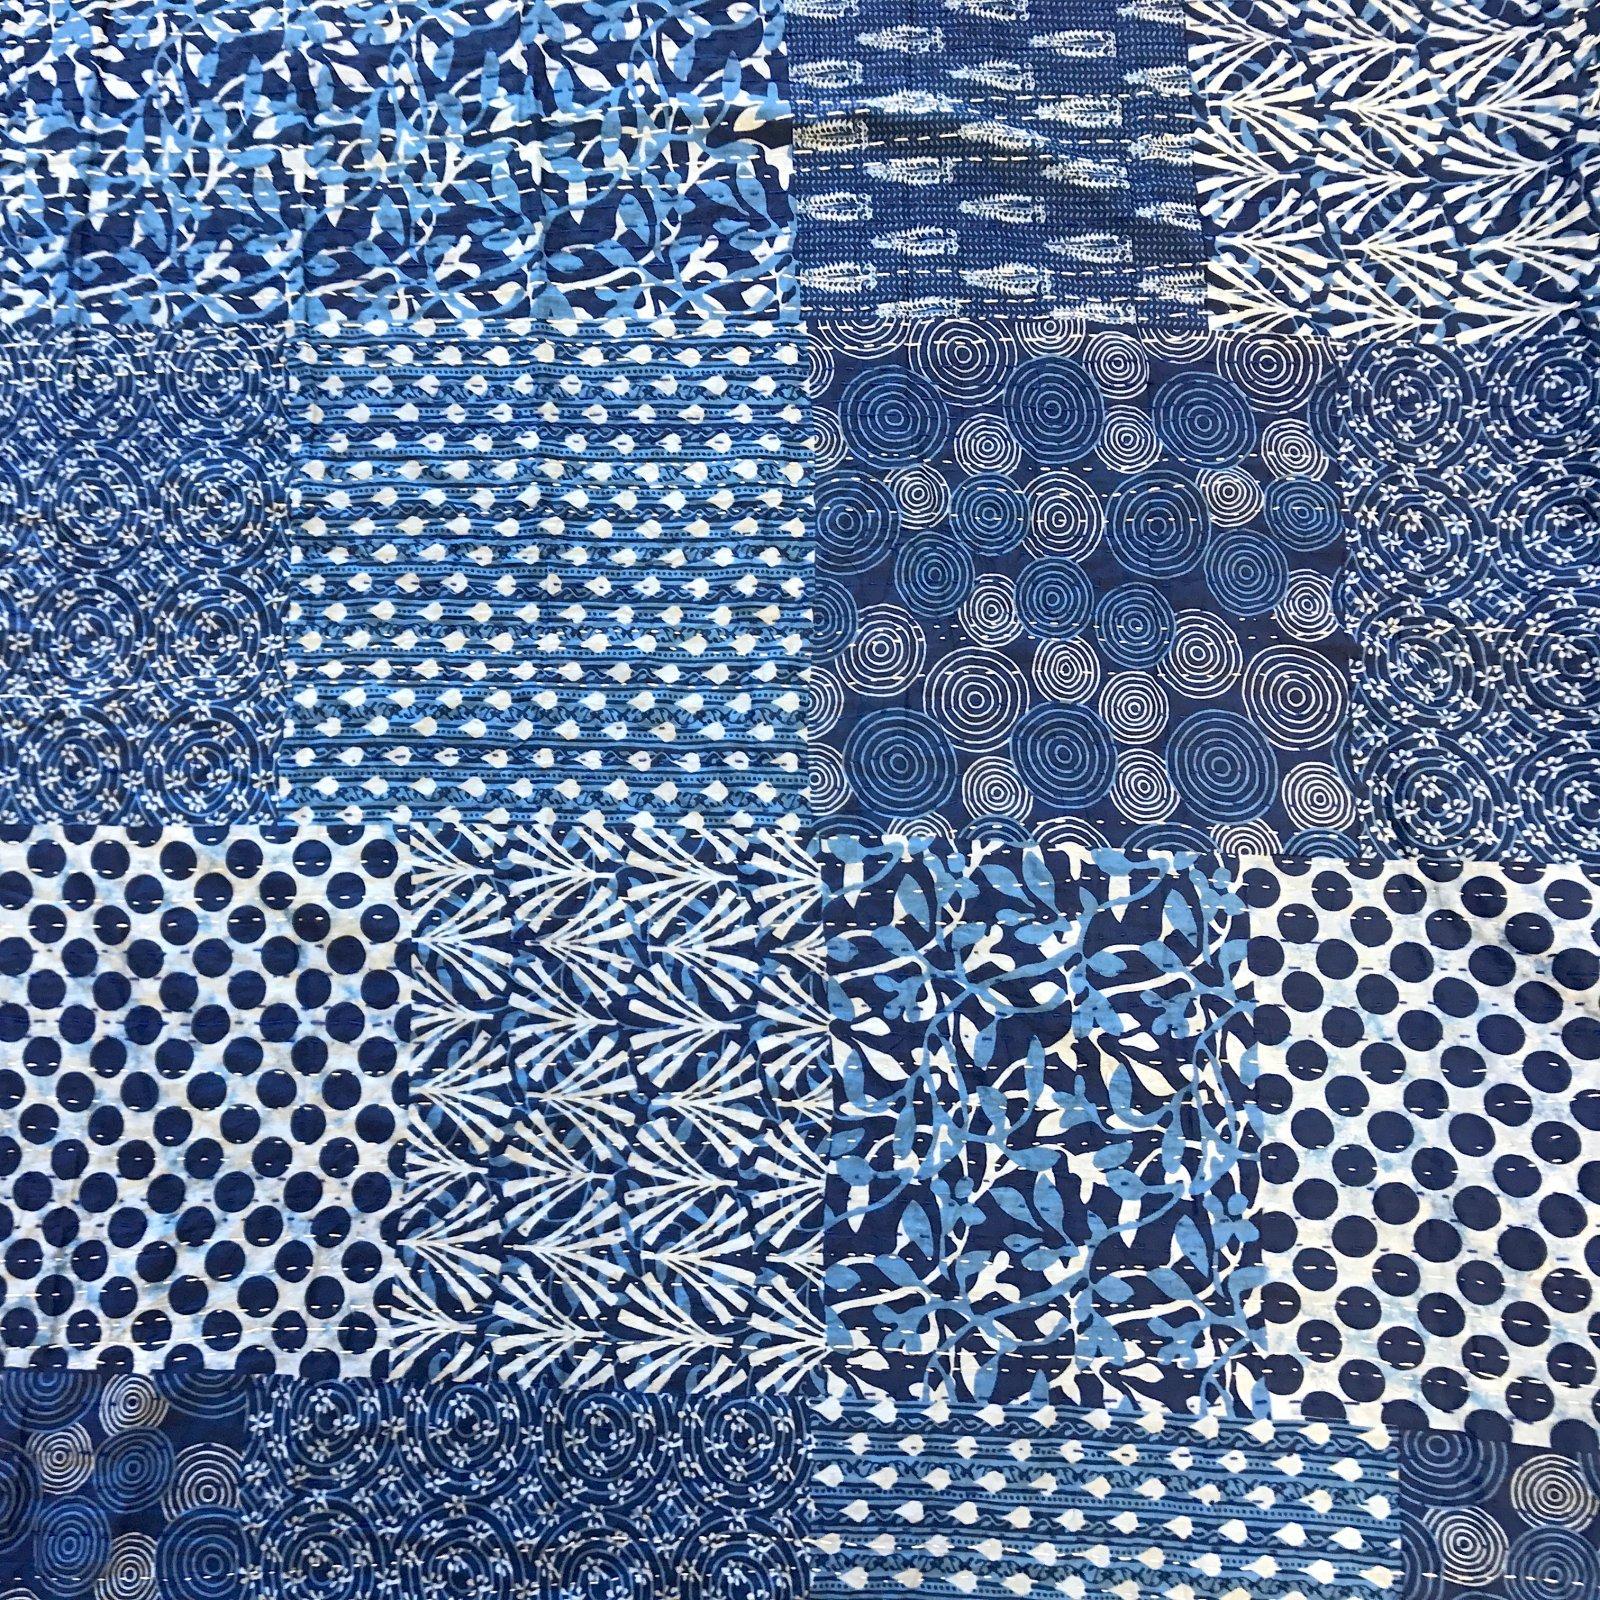 Indian Kantha Cloth - Blue Blocks